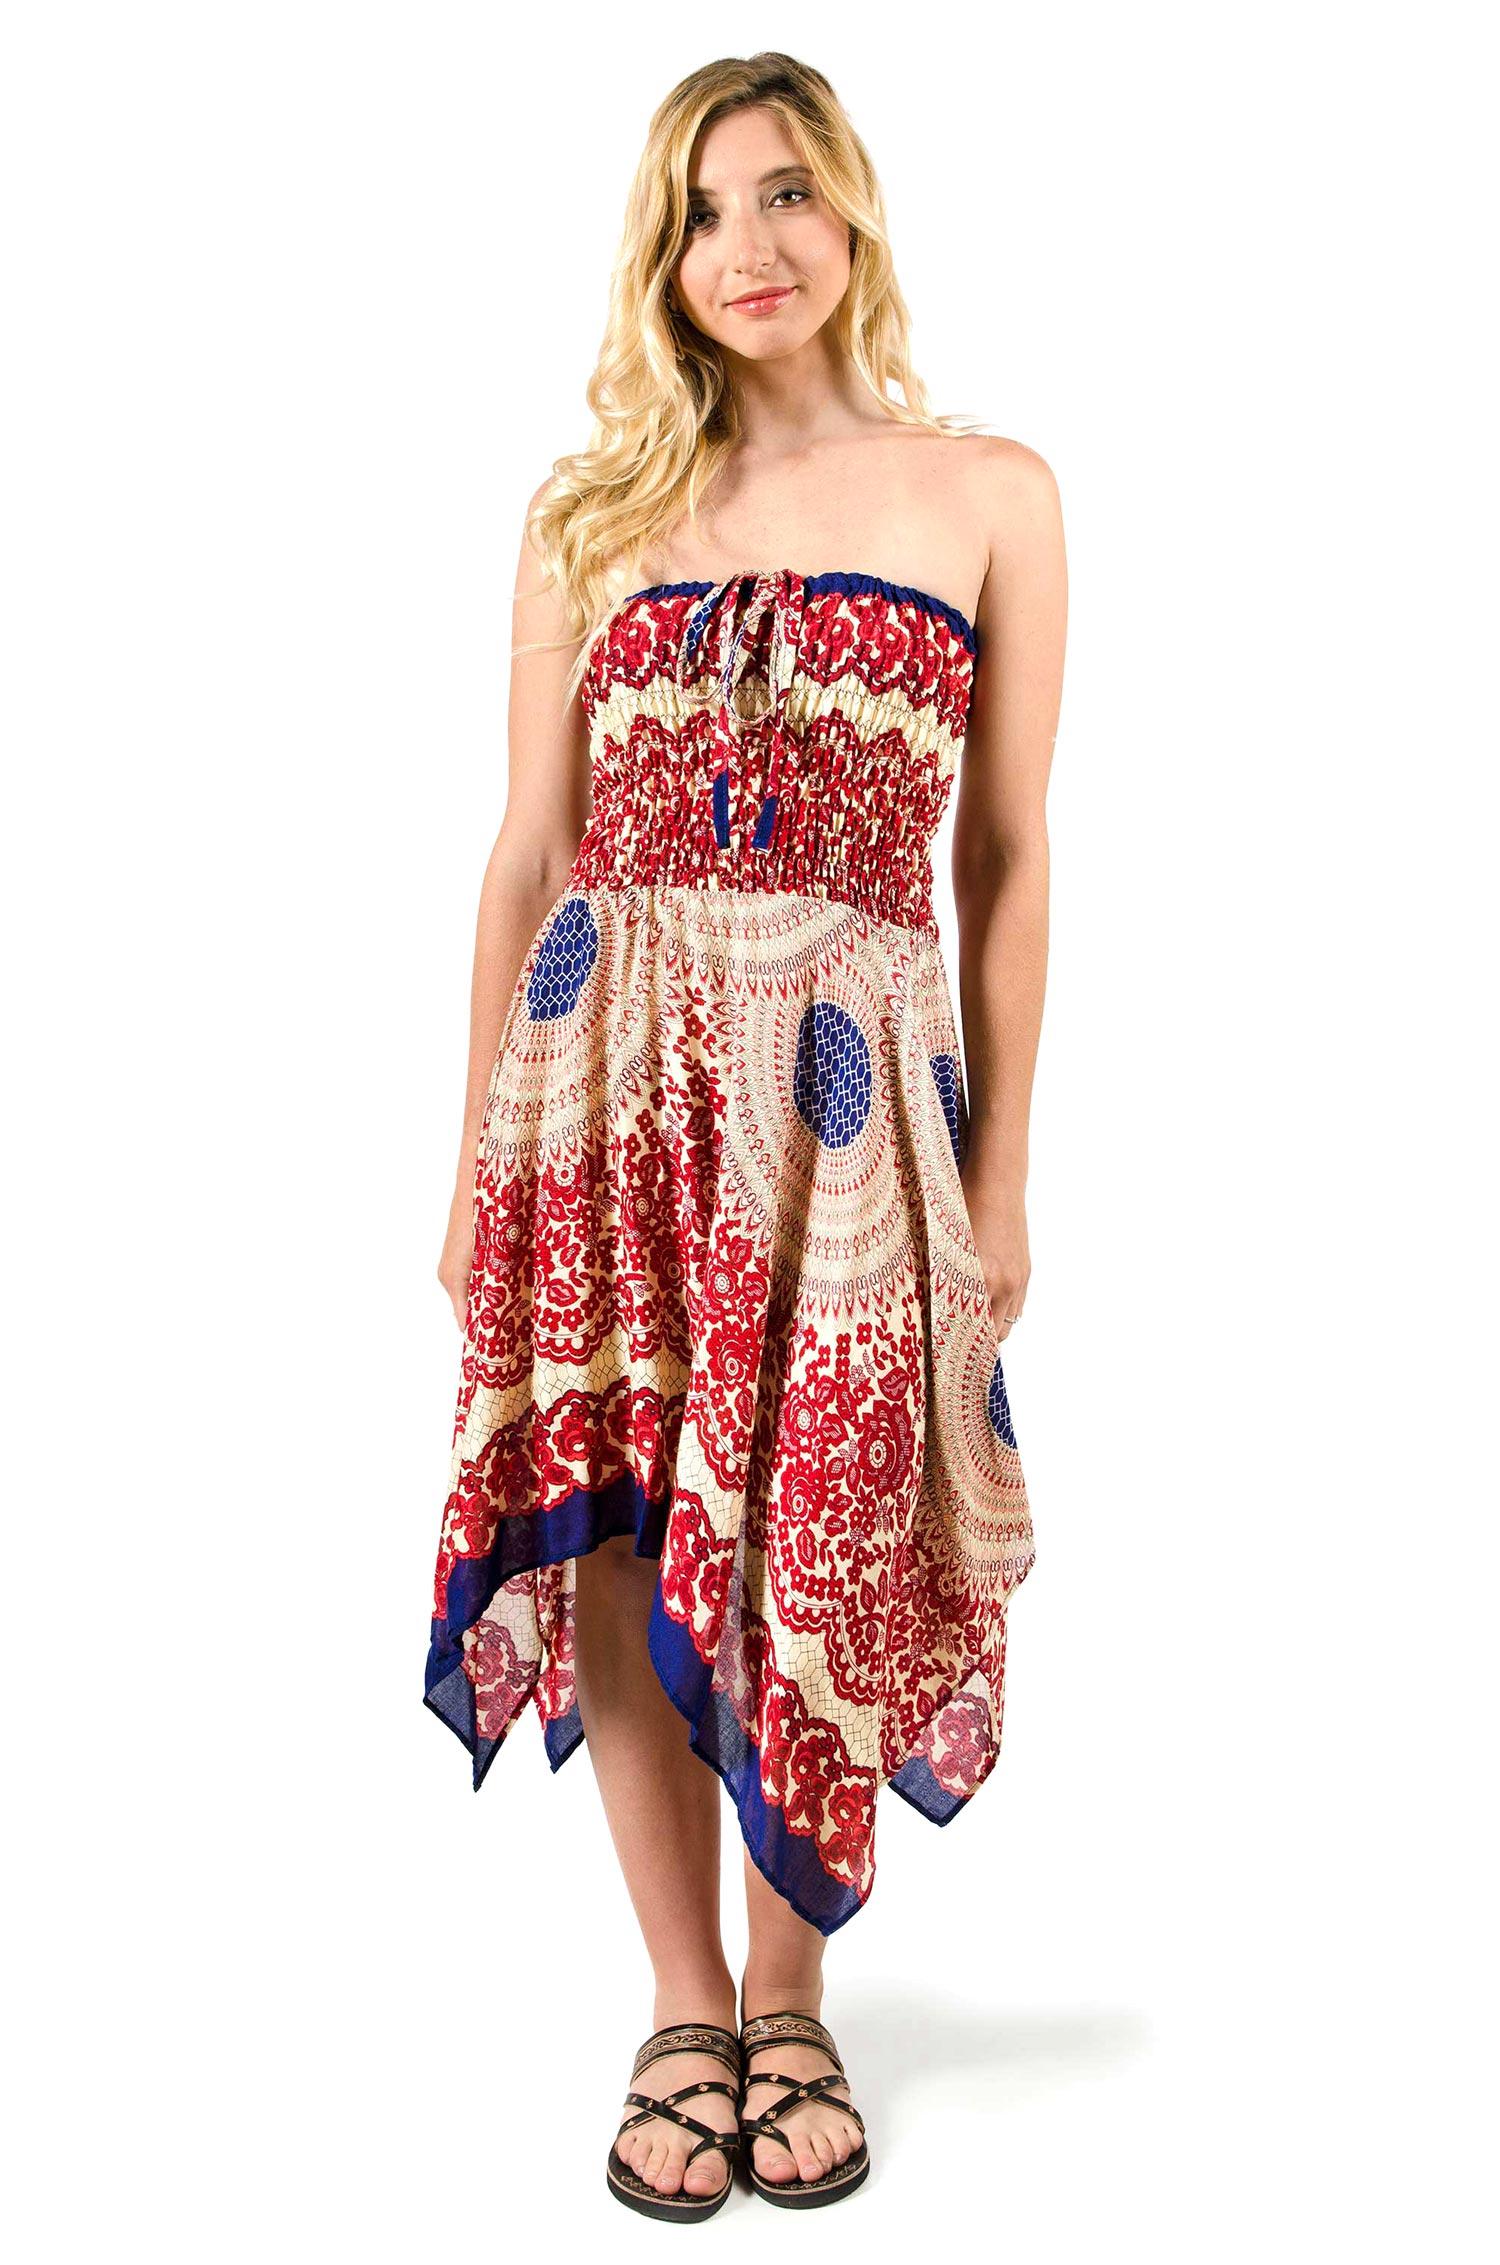 f4338e9dcf1 Convertible Print Fairy Dress   Skirt - Red - 3135R